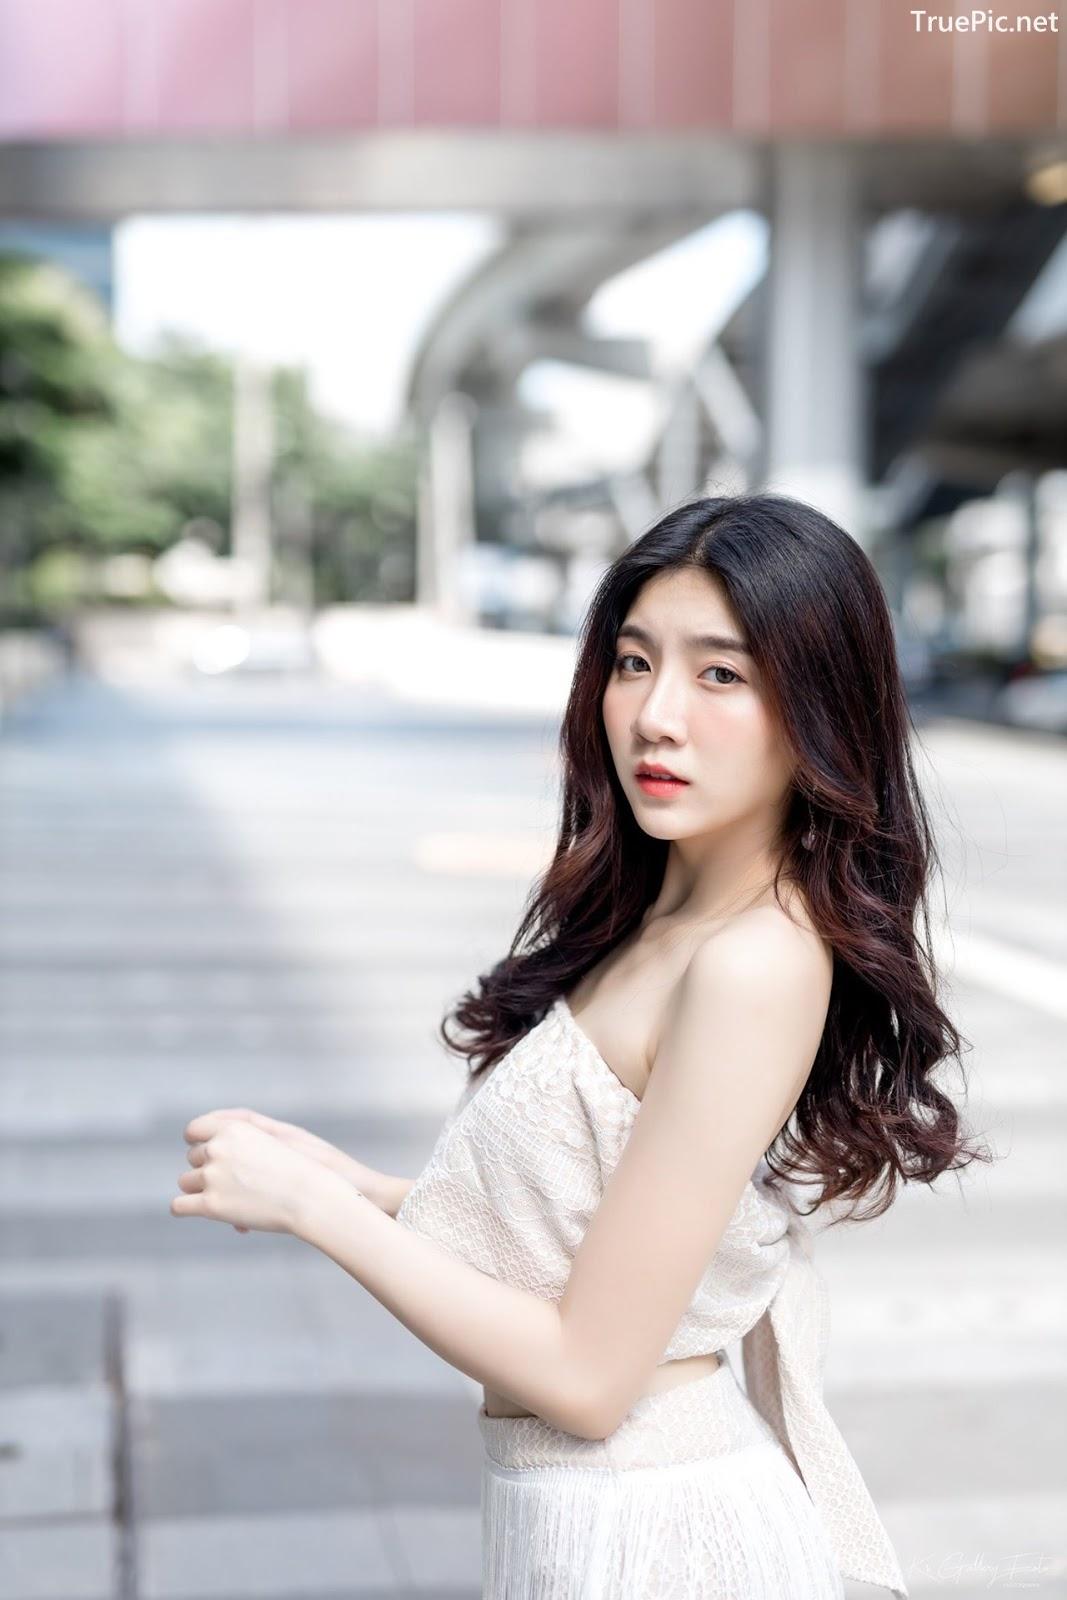 Image Thailand Model - Sasi Ngiunwan - At CentralPlaza Lardprao - TruePic.net - Picture-3